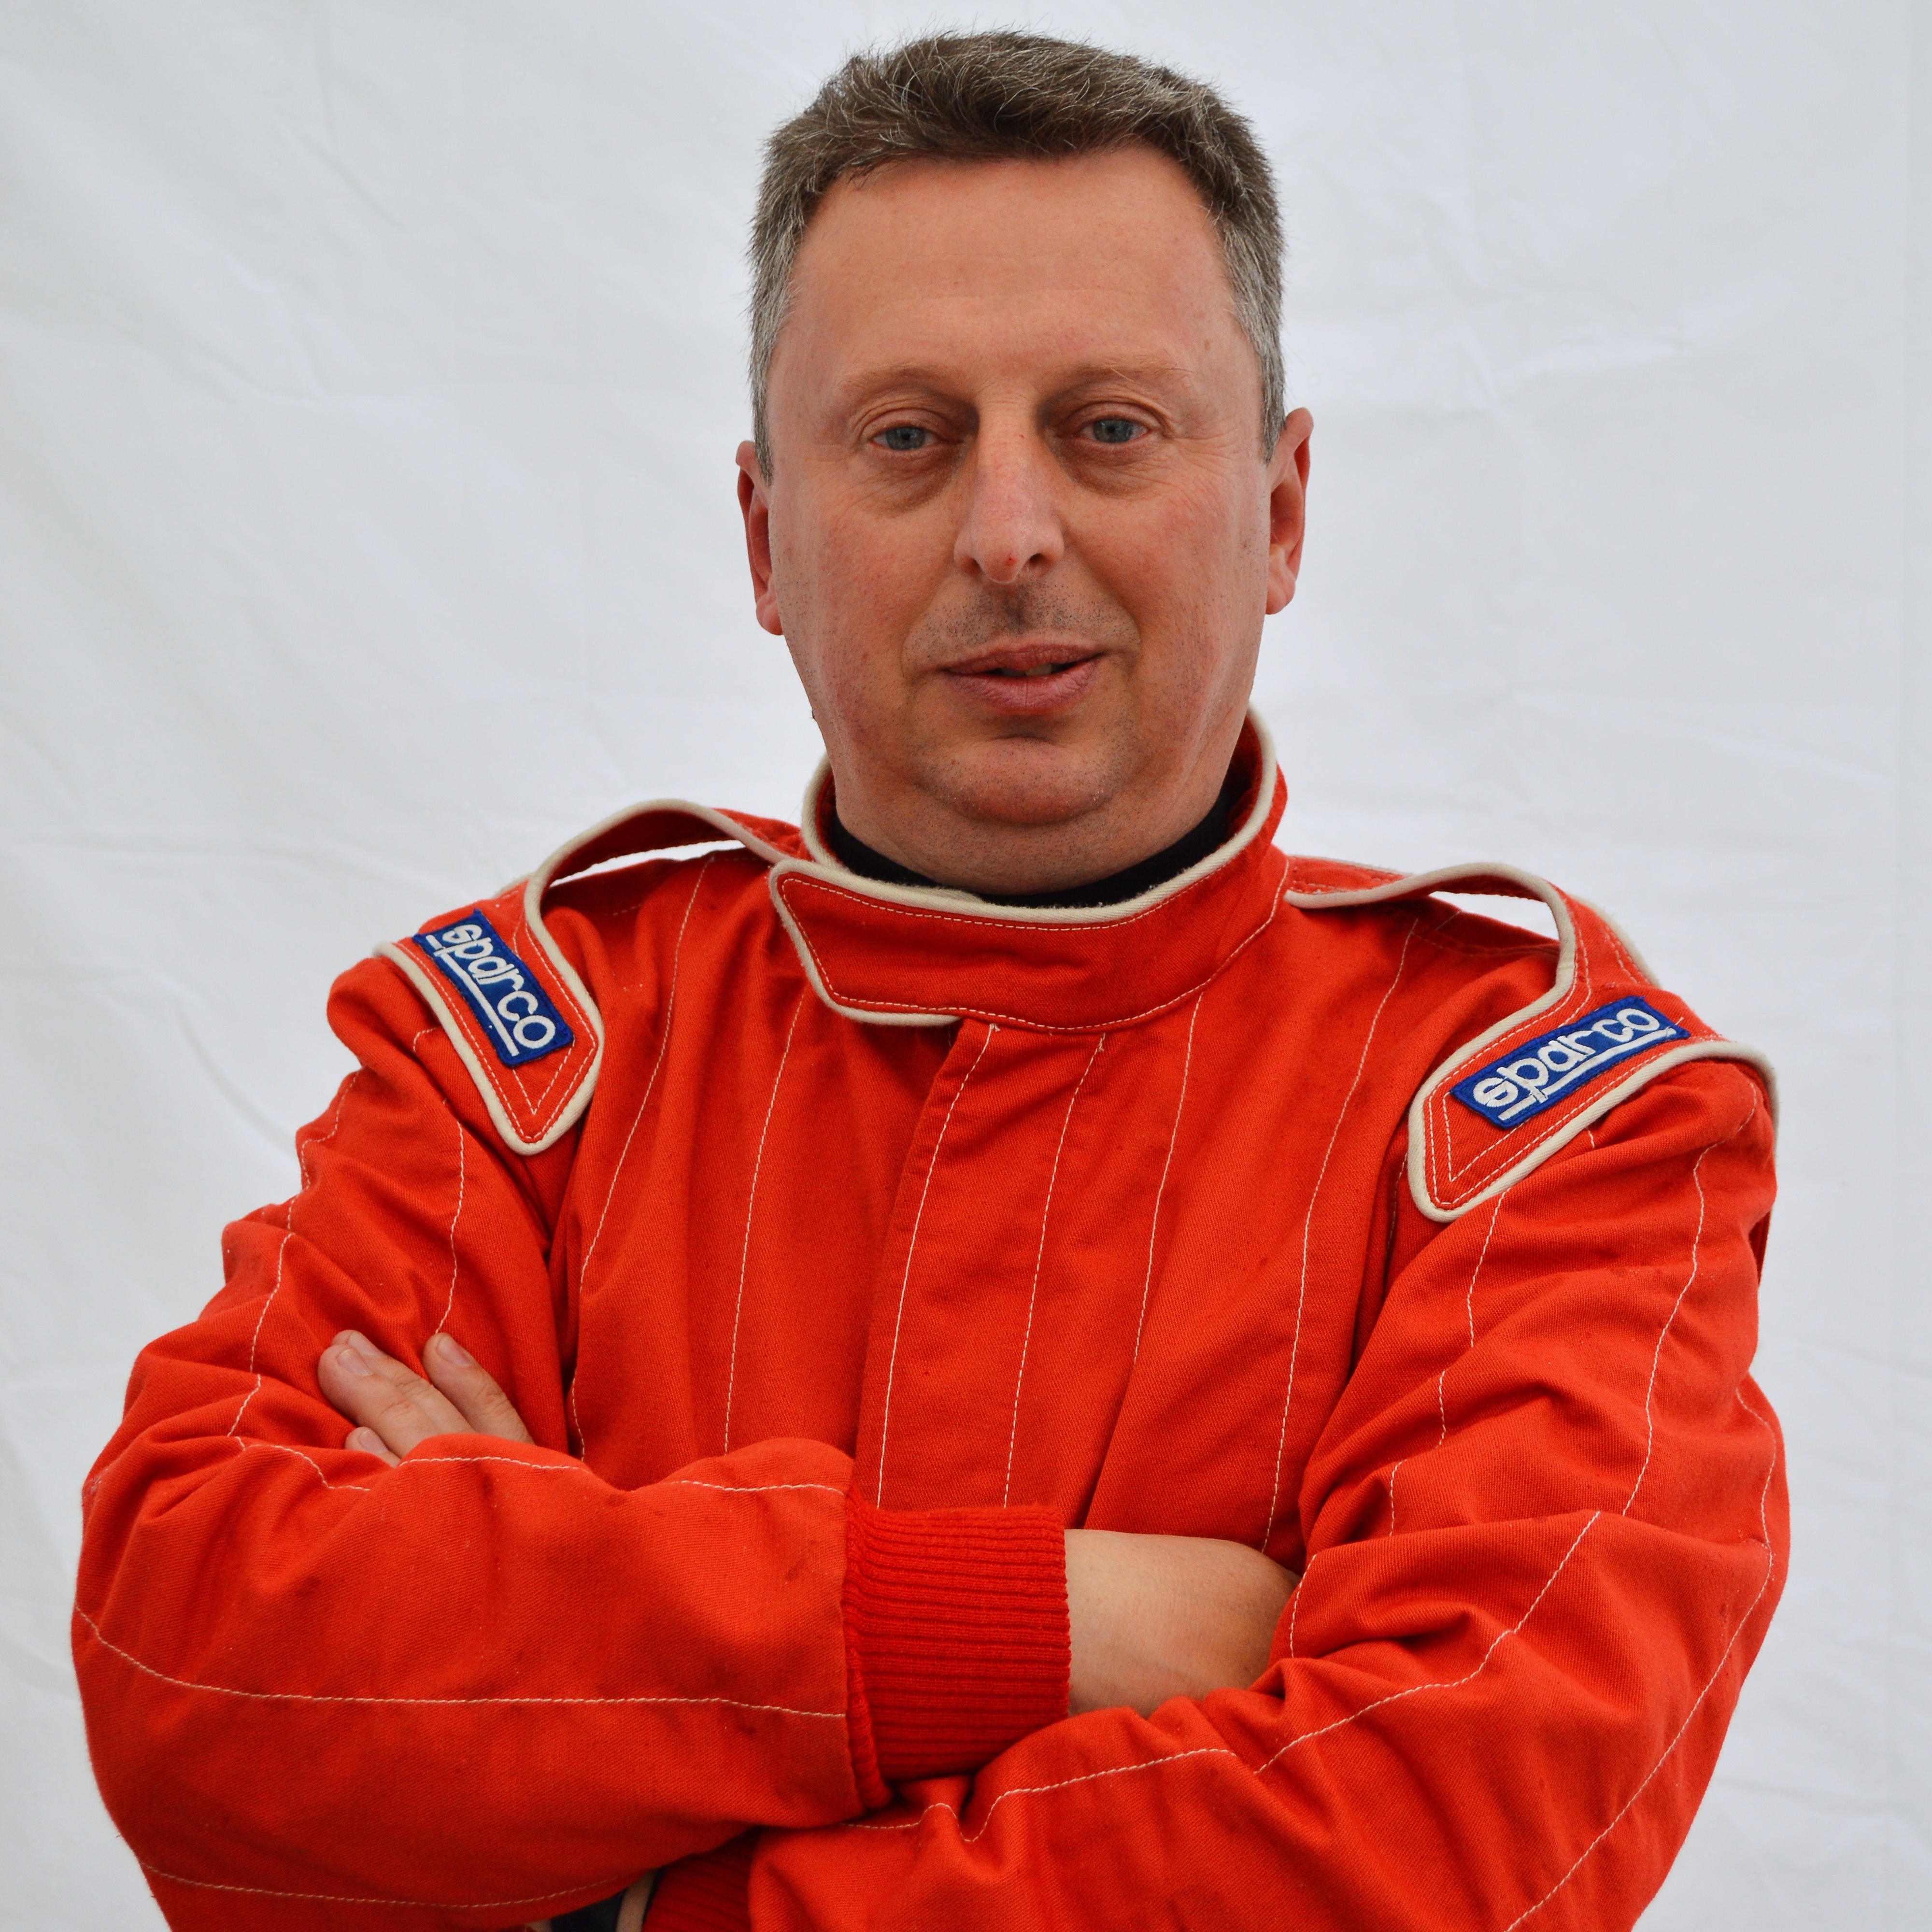 Tihomir Pašić